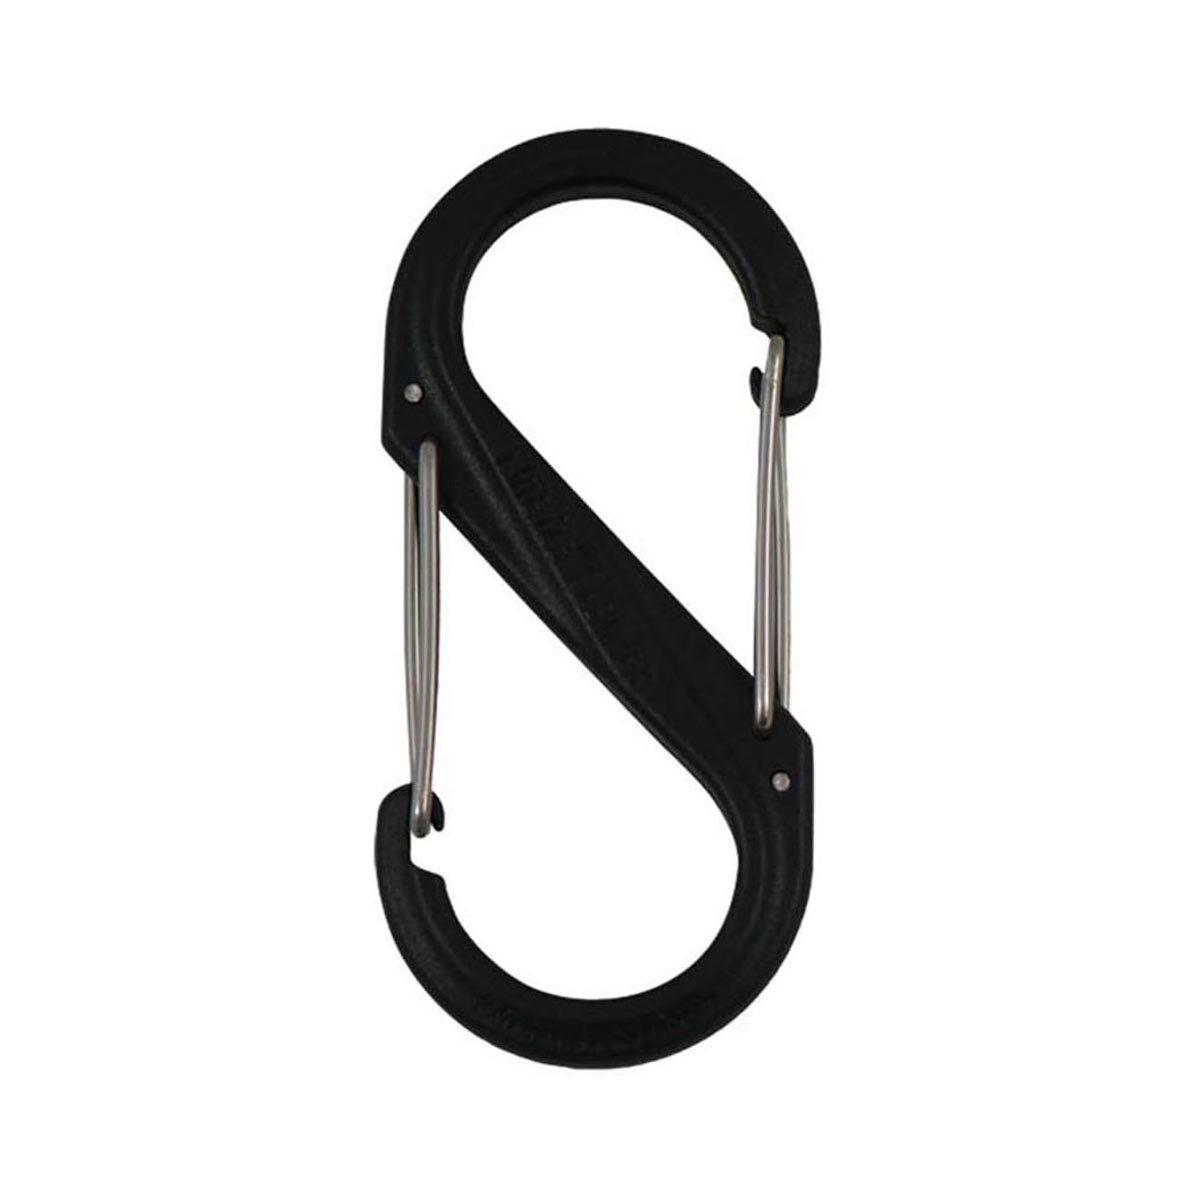 Nite Ize S-Biner Size-2 Dual Carabiner, Strong, Glass-Filled Nylon Plastic - Black